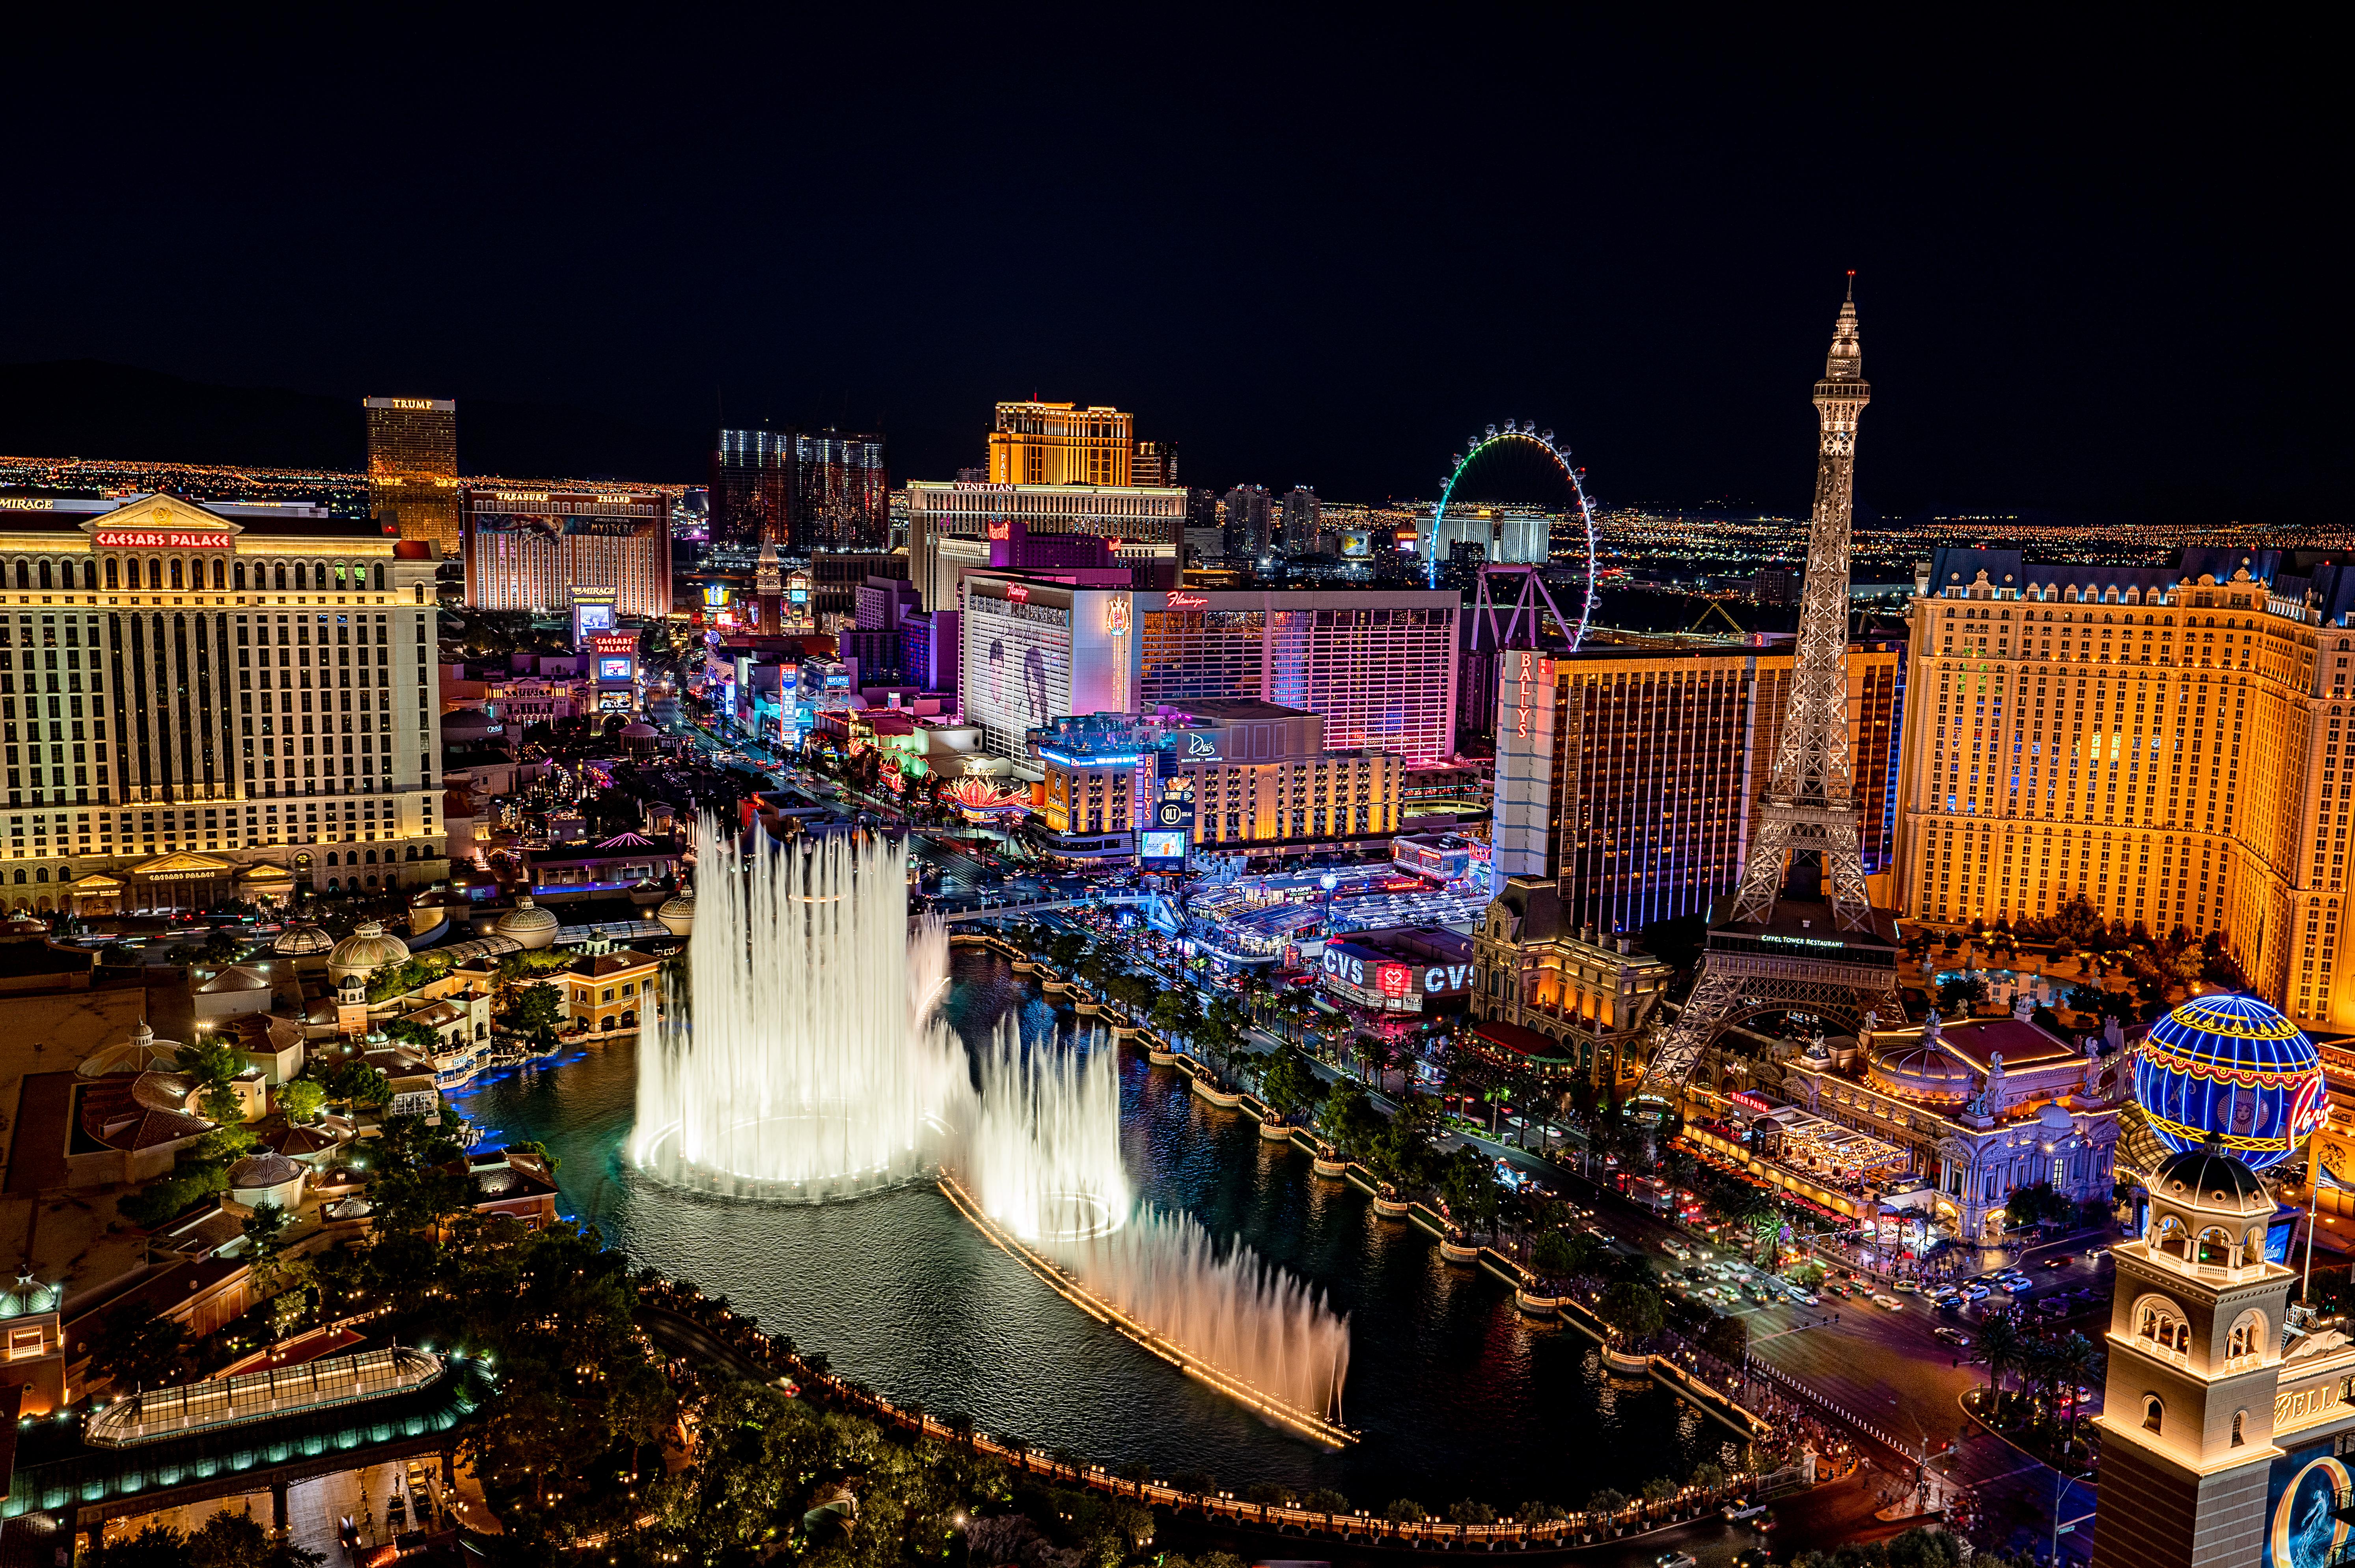 Las Vegas Strip - McKenzie Woodcock for LasVegasRealEstate.com